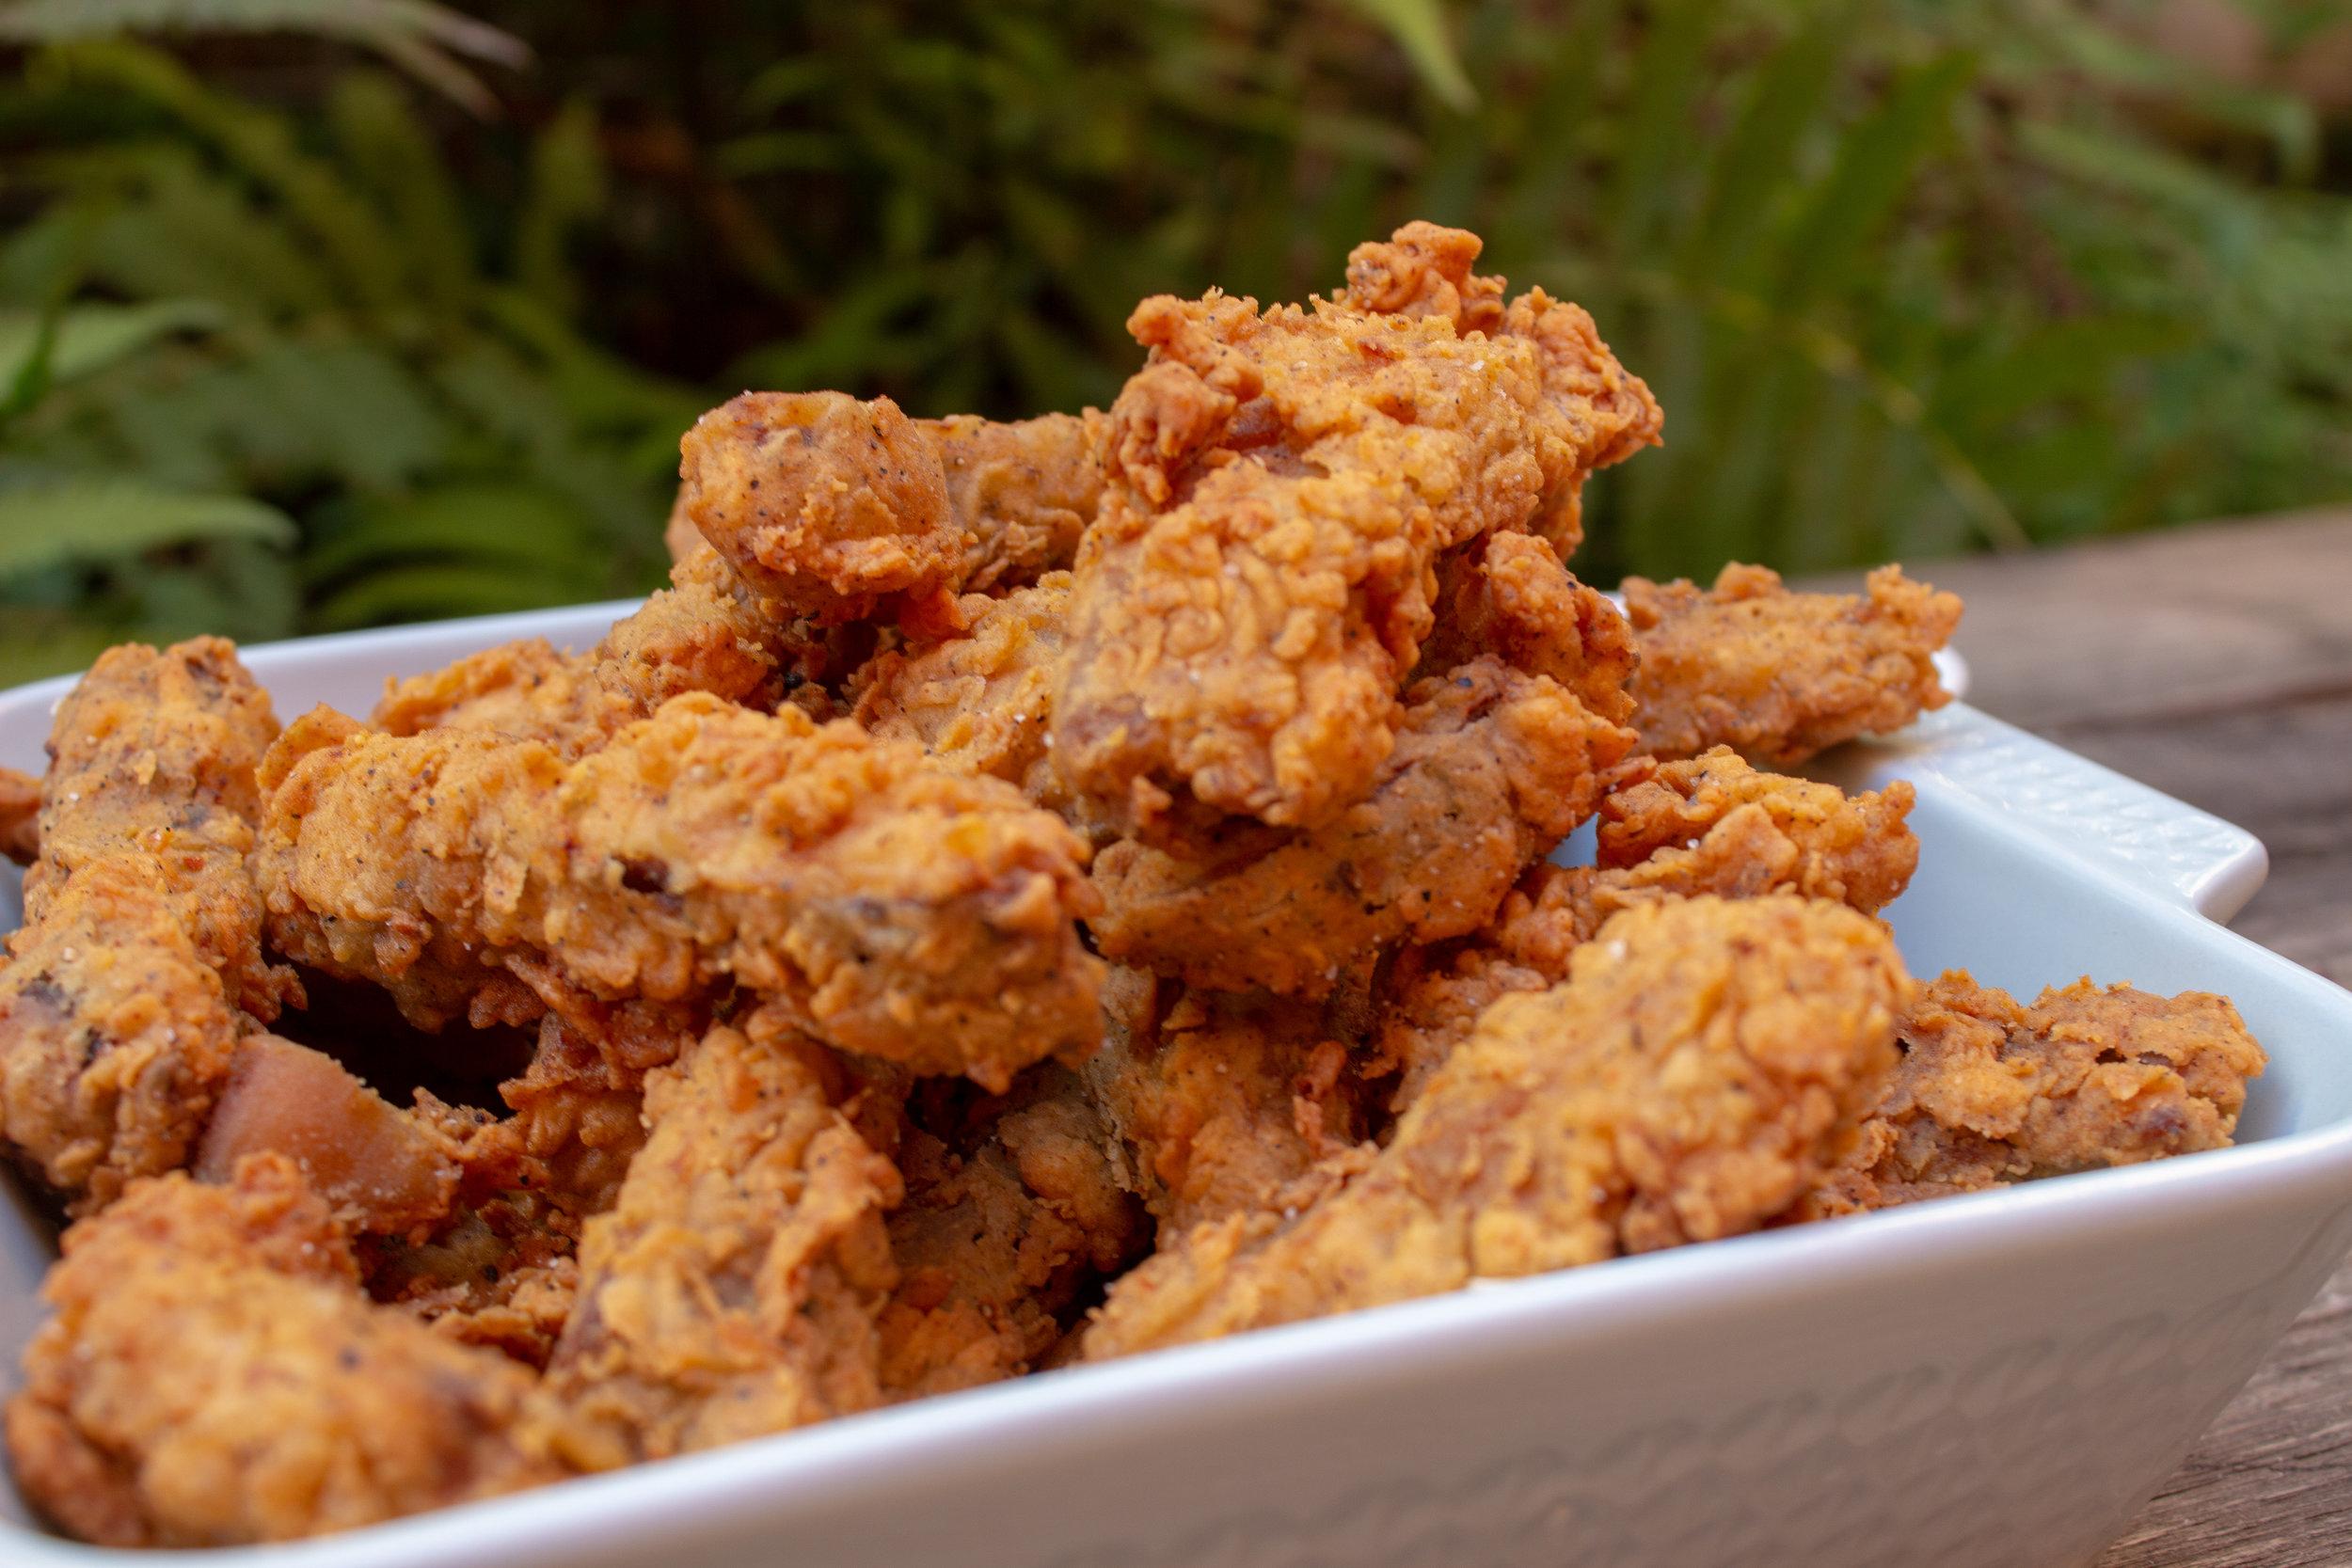 Smoked Fried Chicken Strips